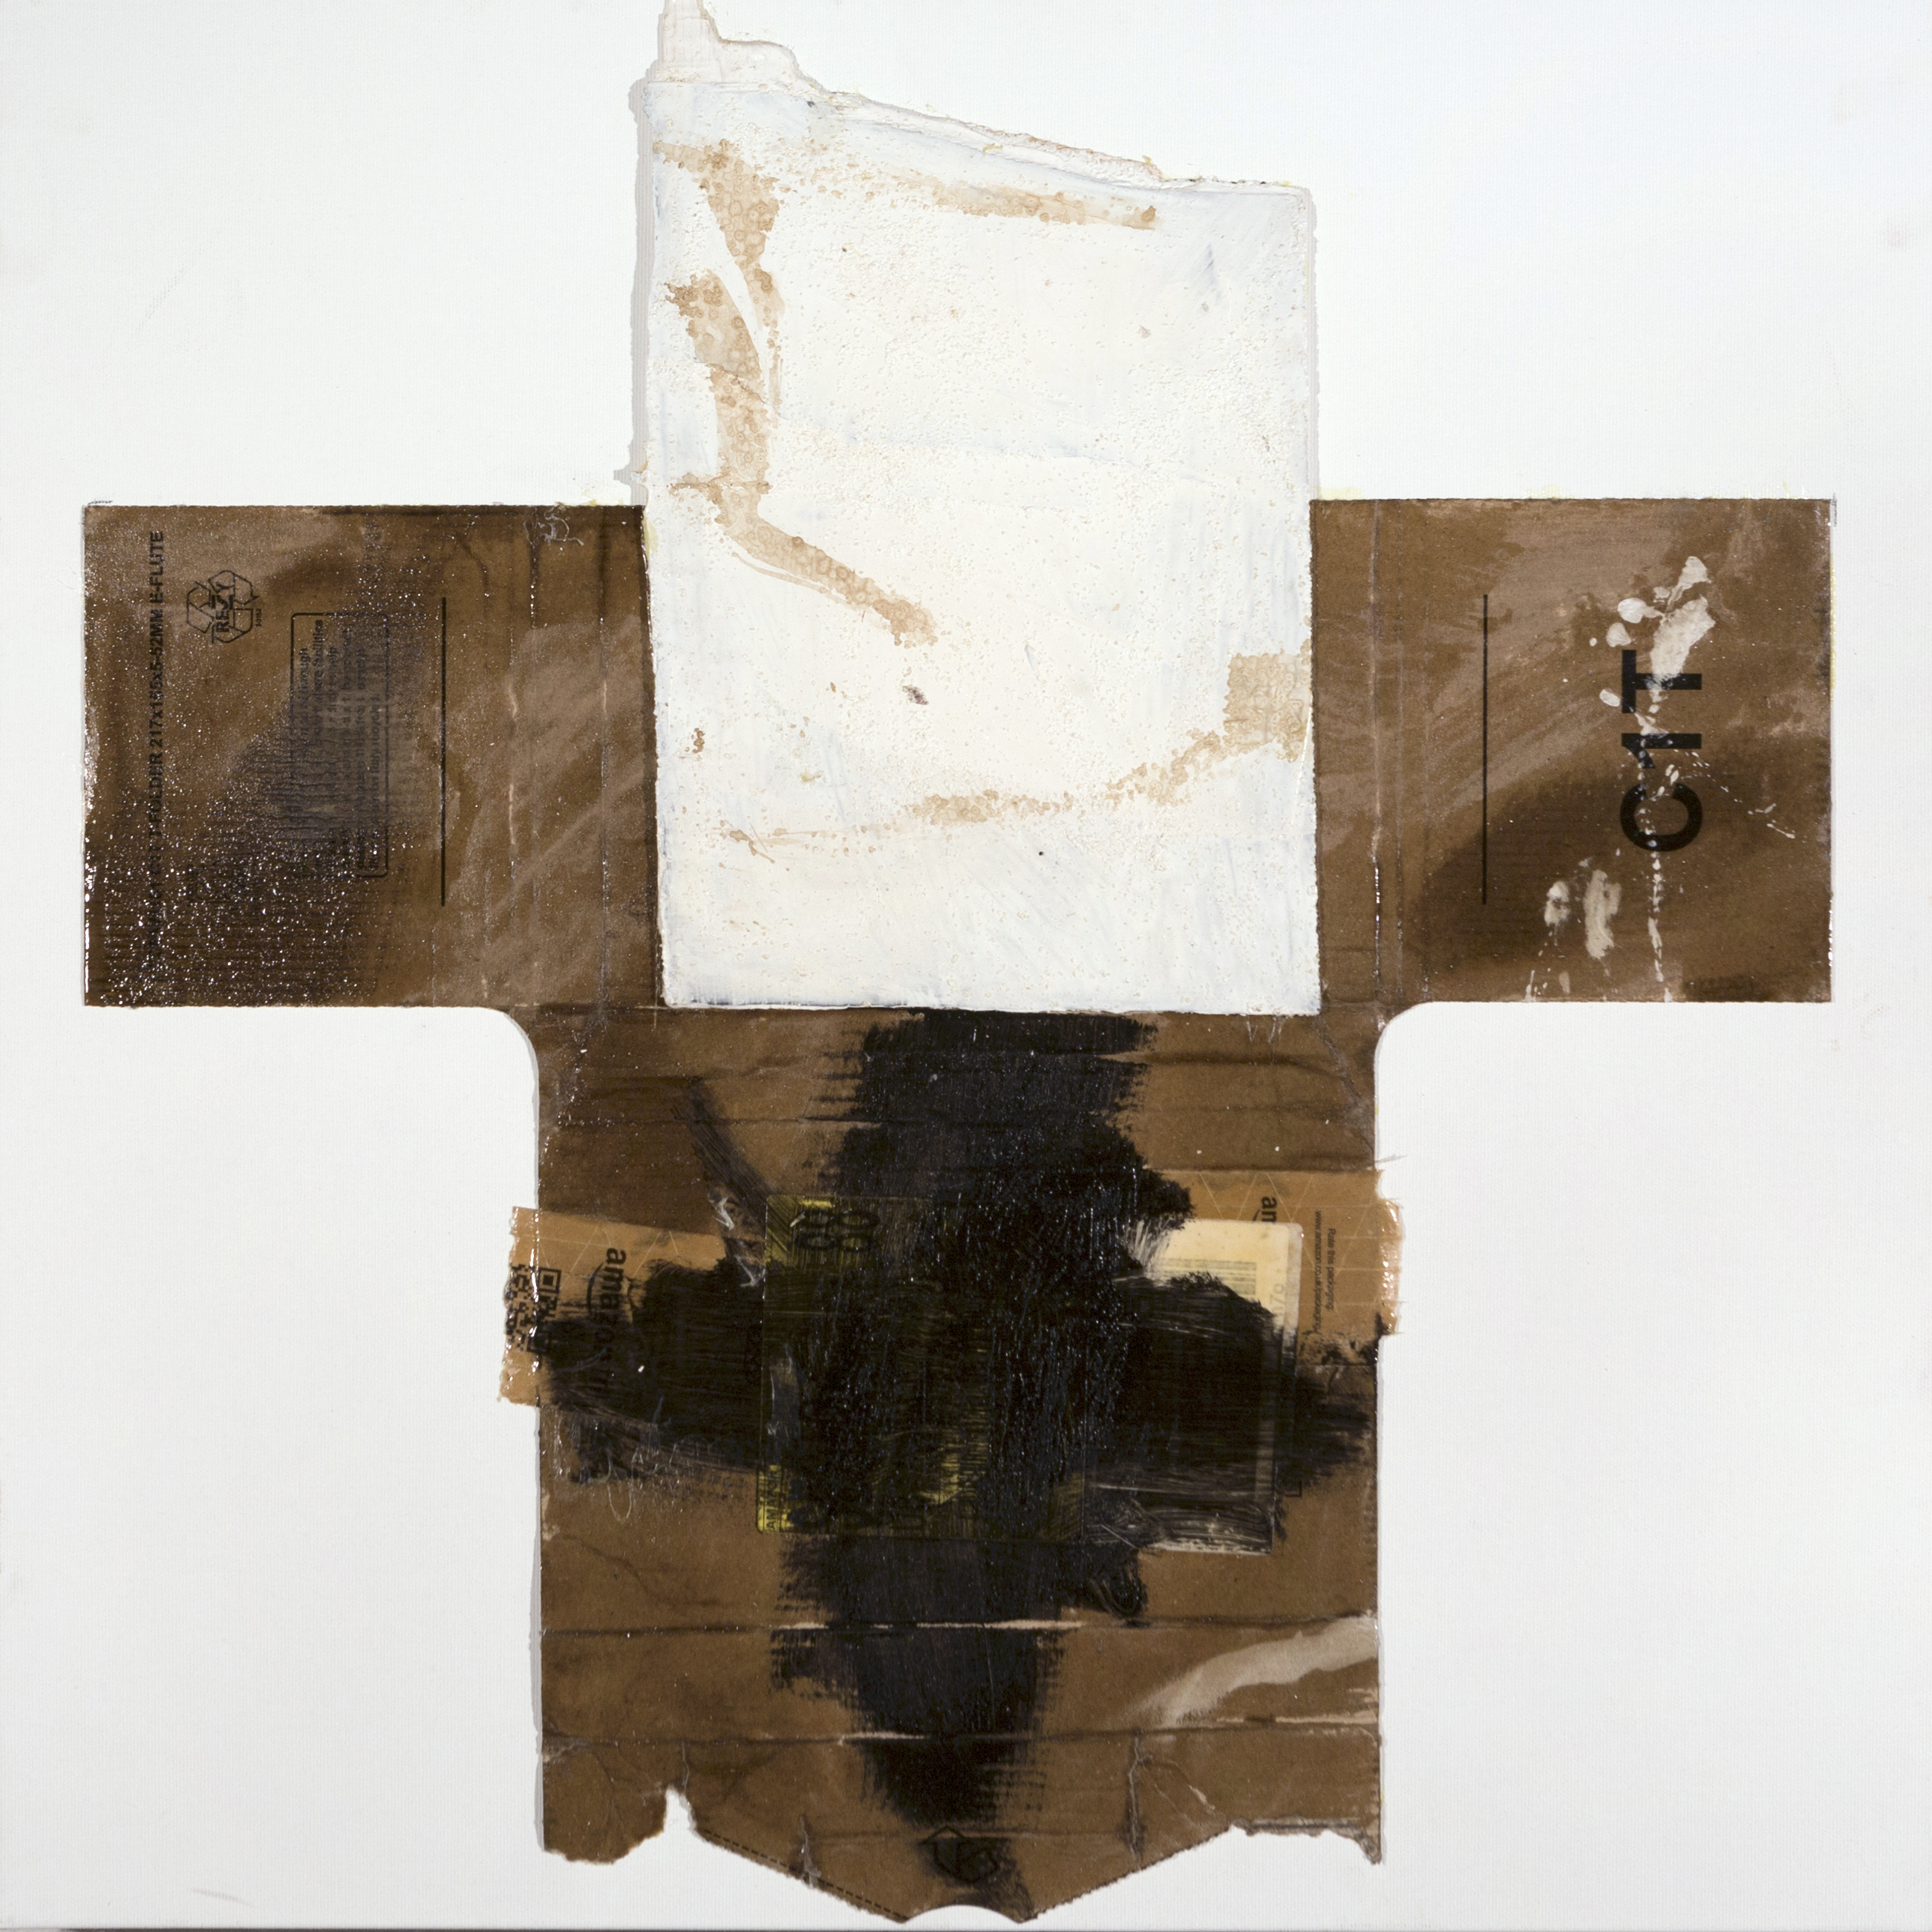 AP Ec 2_9-10, 2015, tecnica mista, cartone e legno su tela, cm 60 x 60